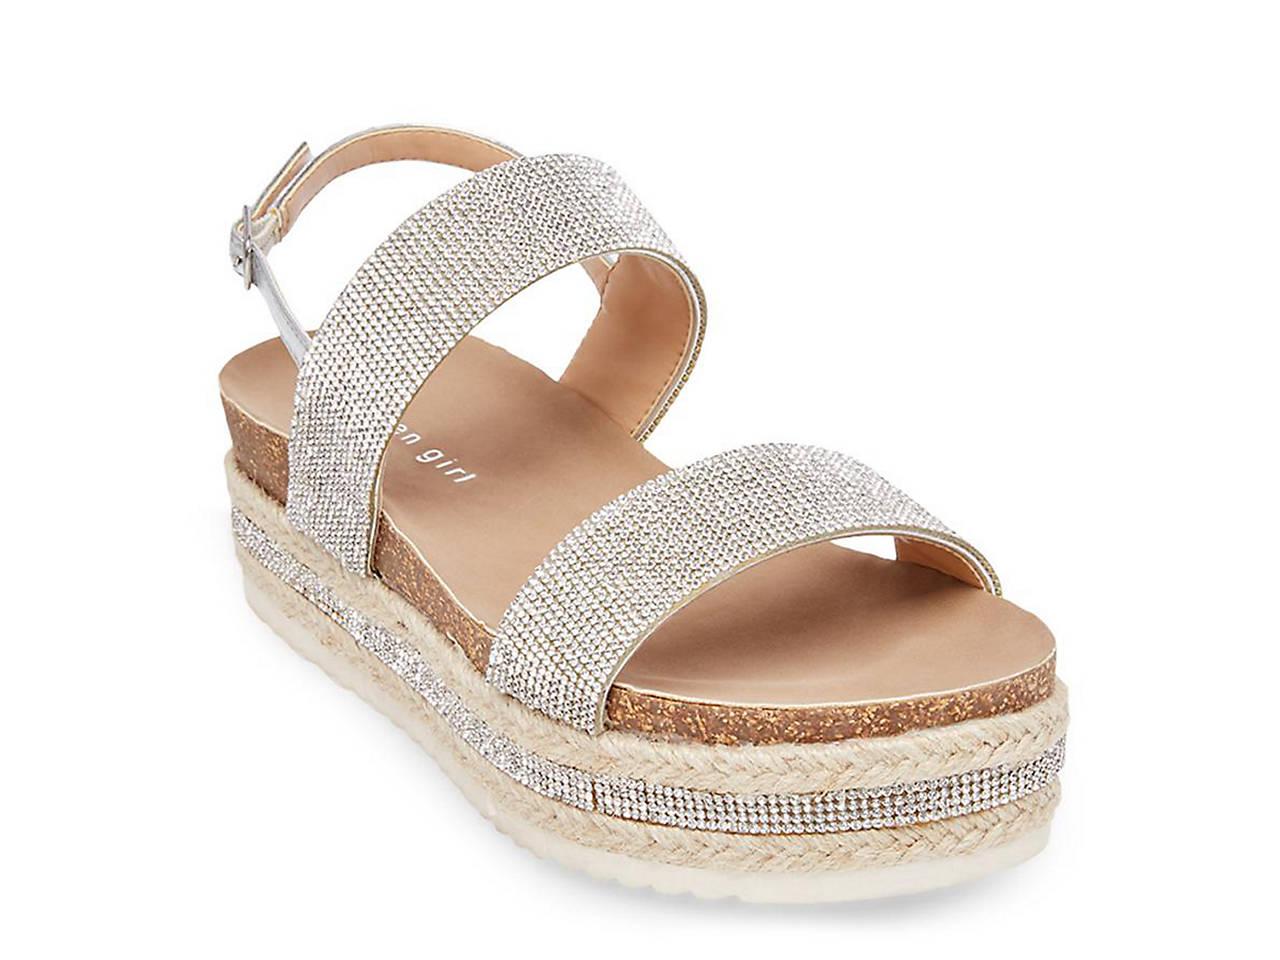 b44184445763c Madden Girl Glitzie Espadrille Platform Sandal Women s Shoes